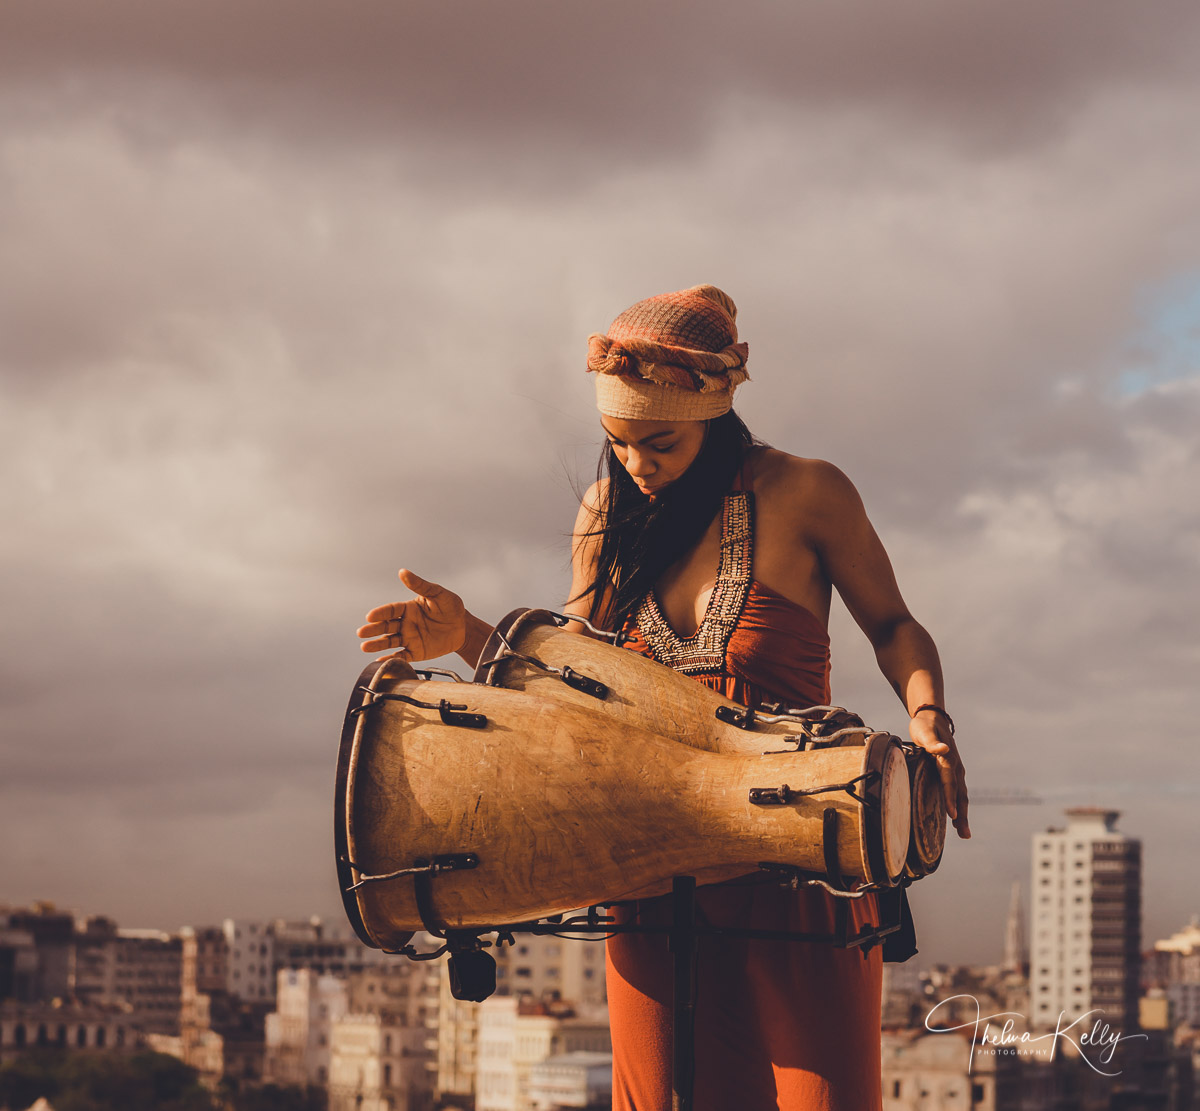 Havana, Cuba, Malecón, musician, drummer, bongo drum, music video, photo